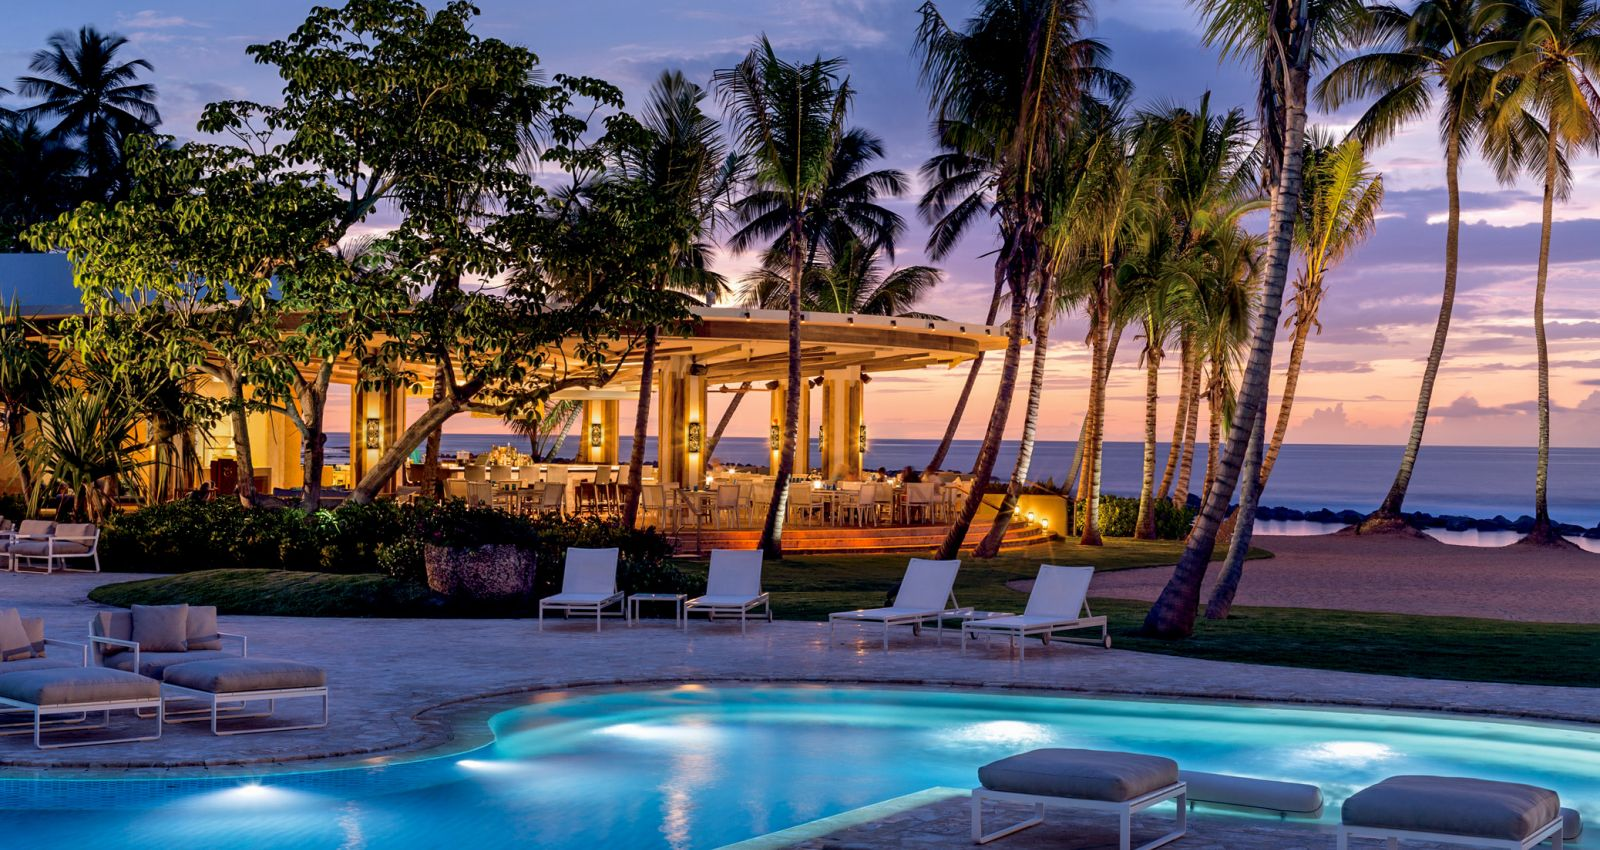 Encanto Beach Club and Grill